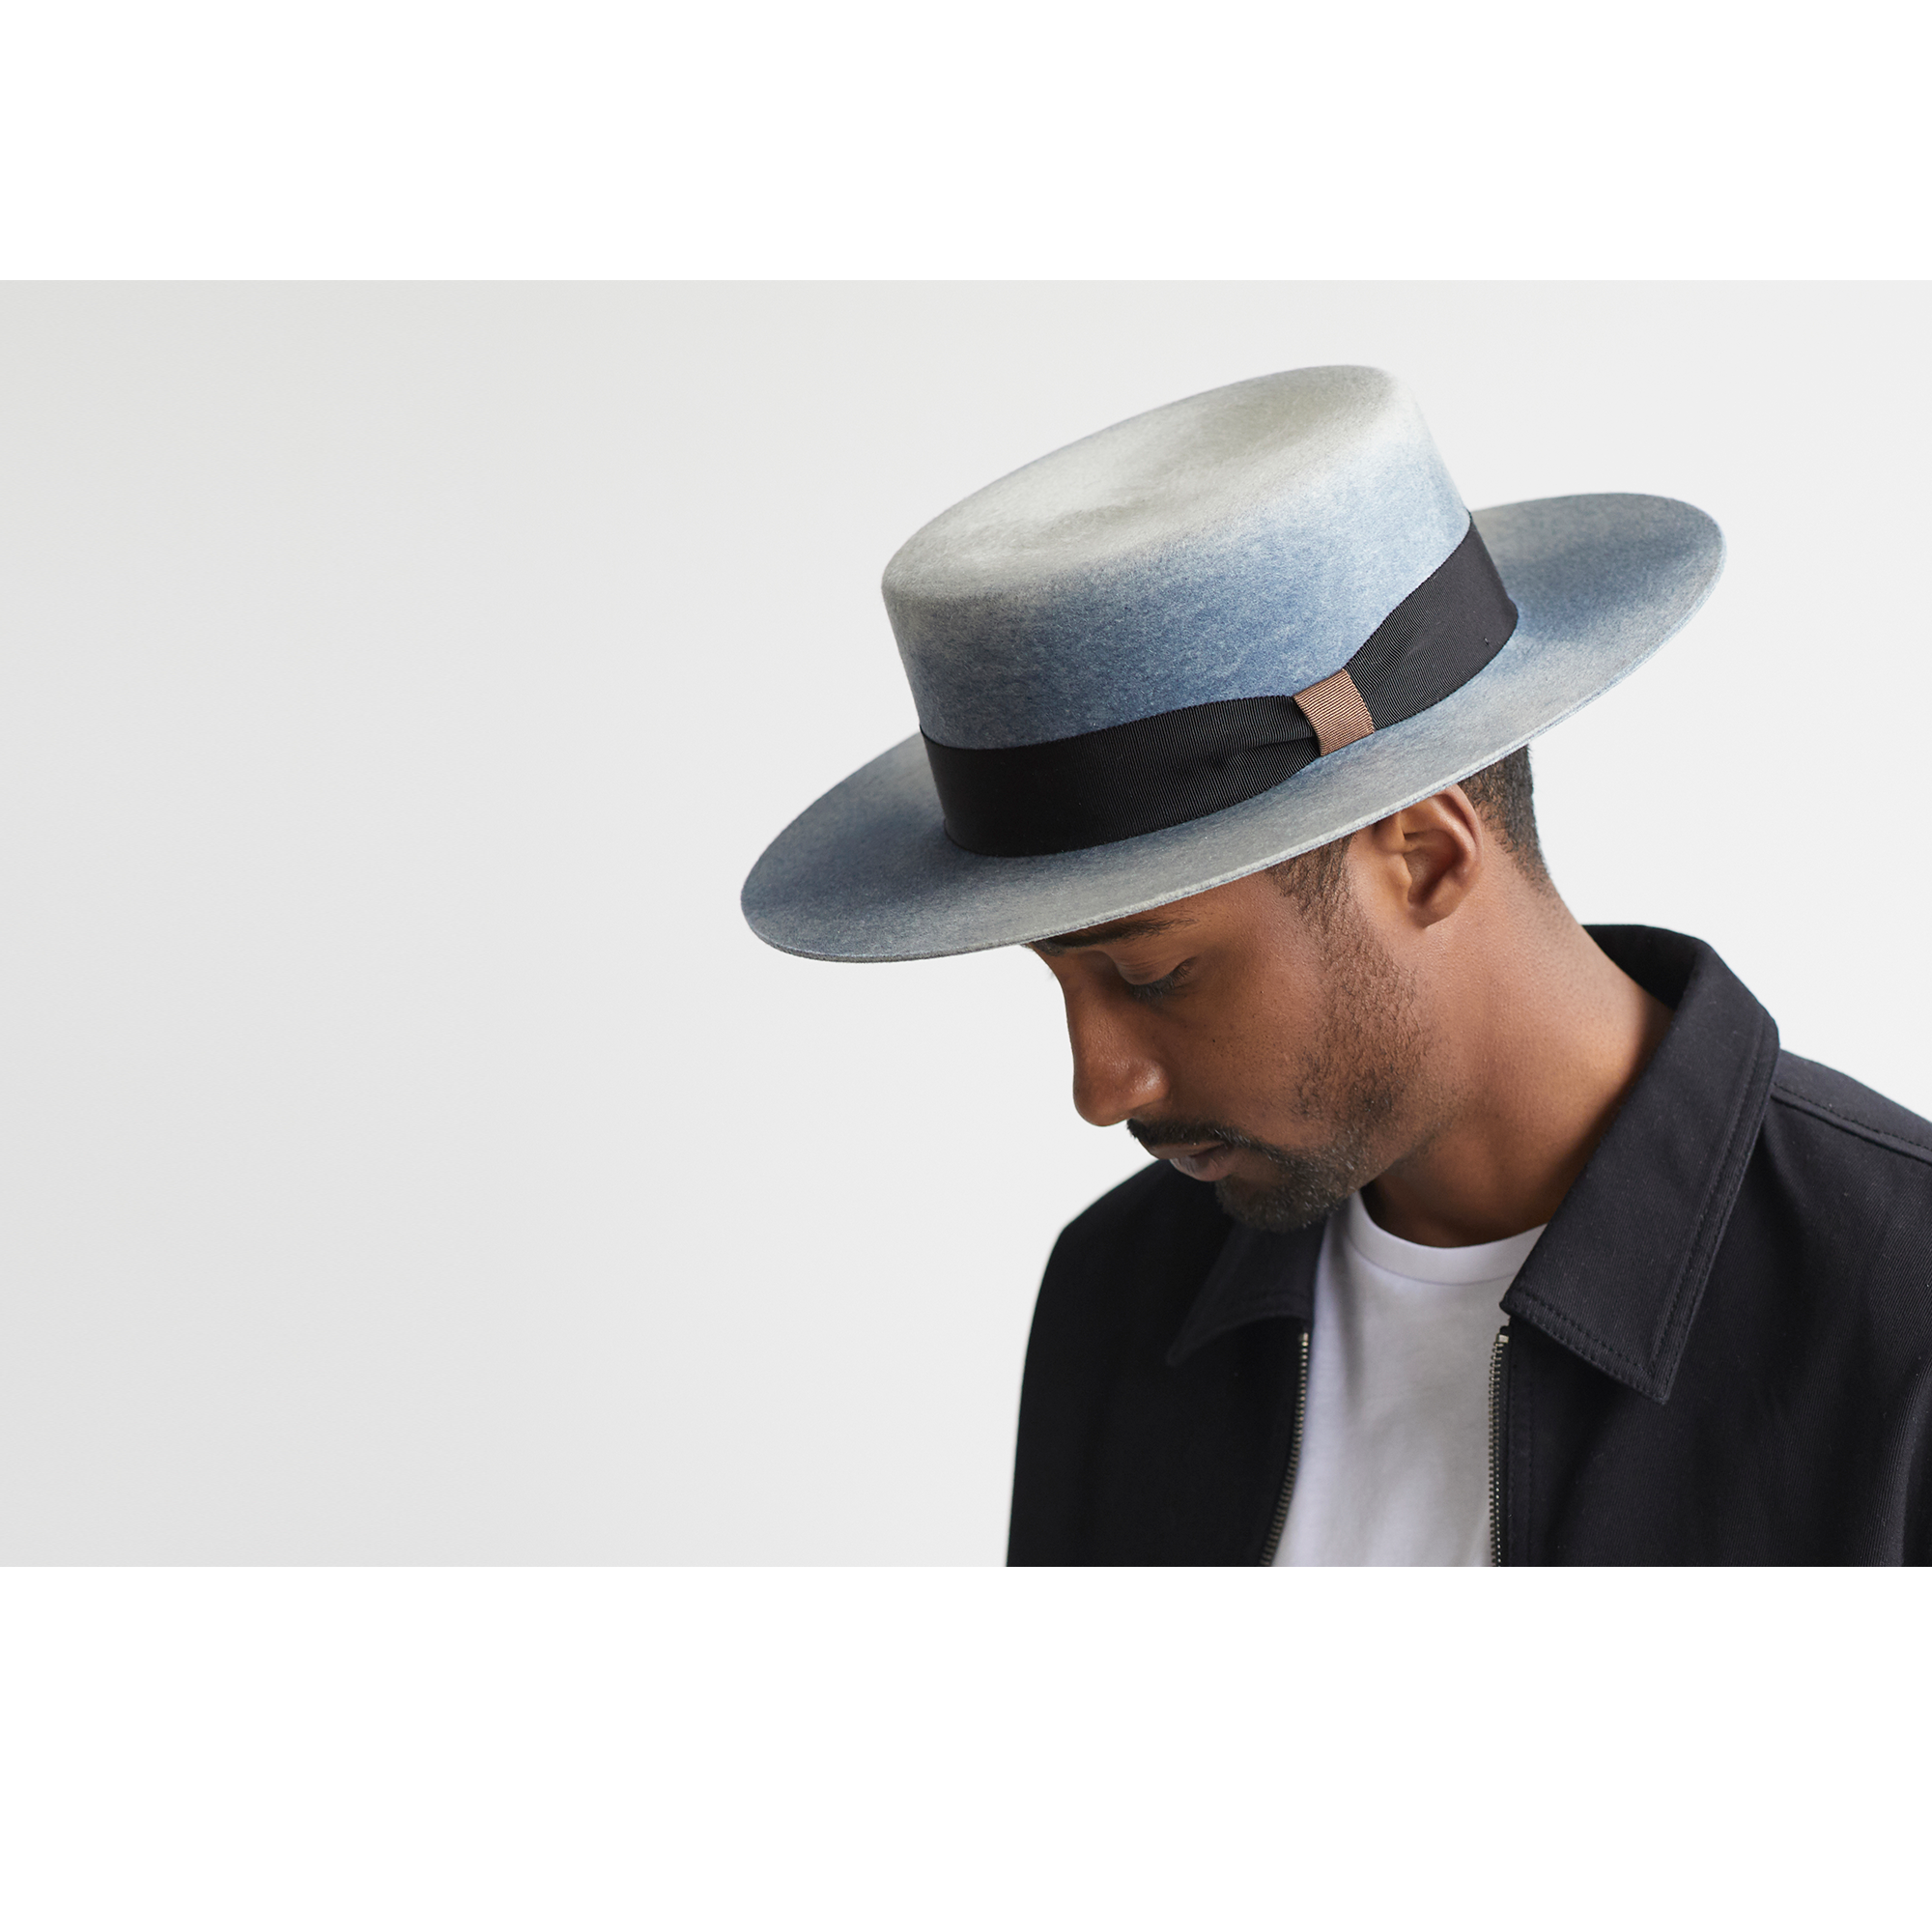 Goorin Skyline Fedora Hat in Green/Blue, size Small